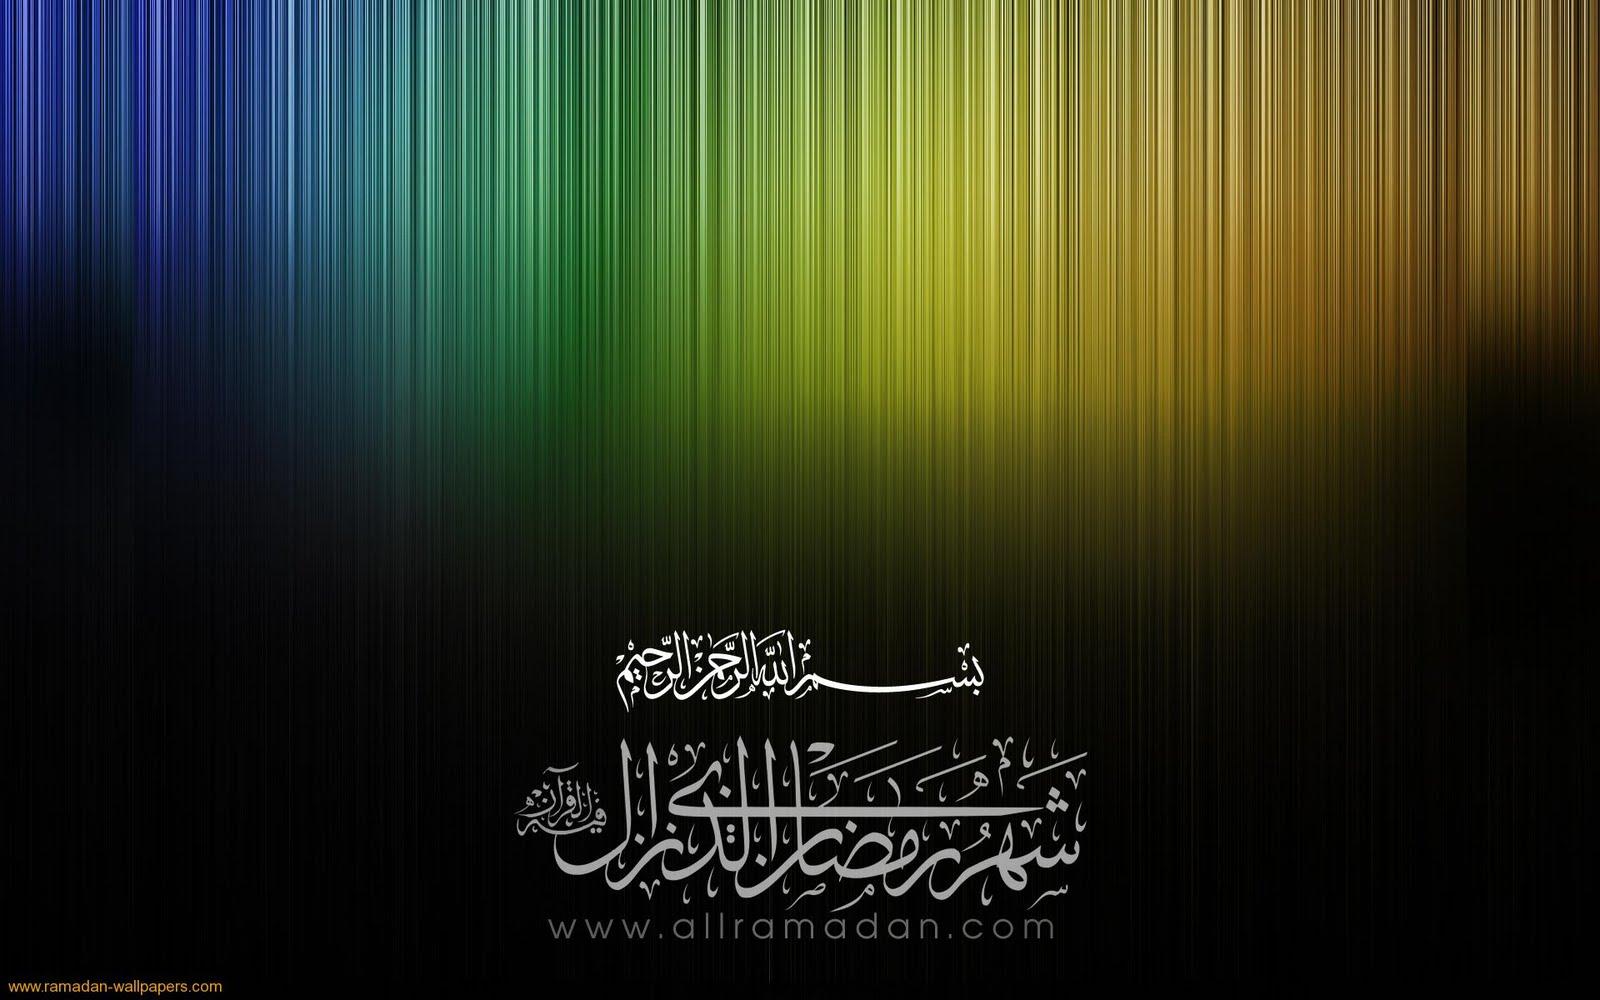 Ramadan Karim Wallpapers HD 2011-12 | New Wallpapers Ramadan Special 2011-12